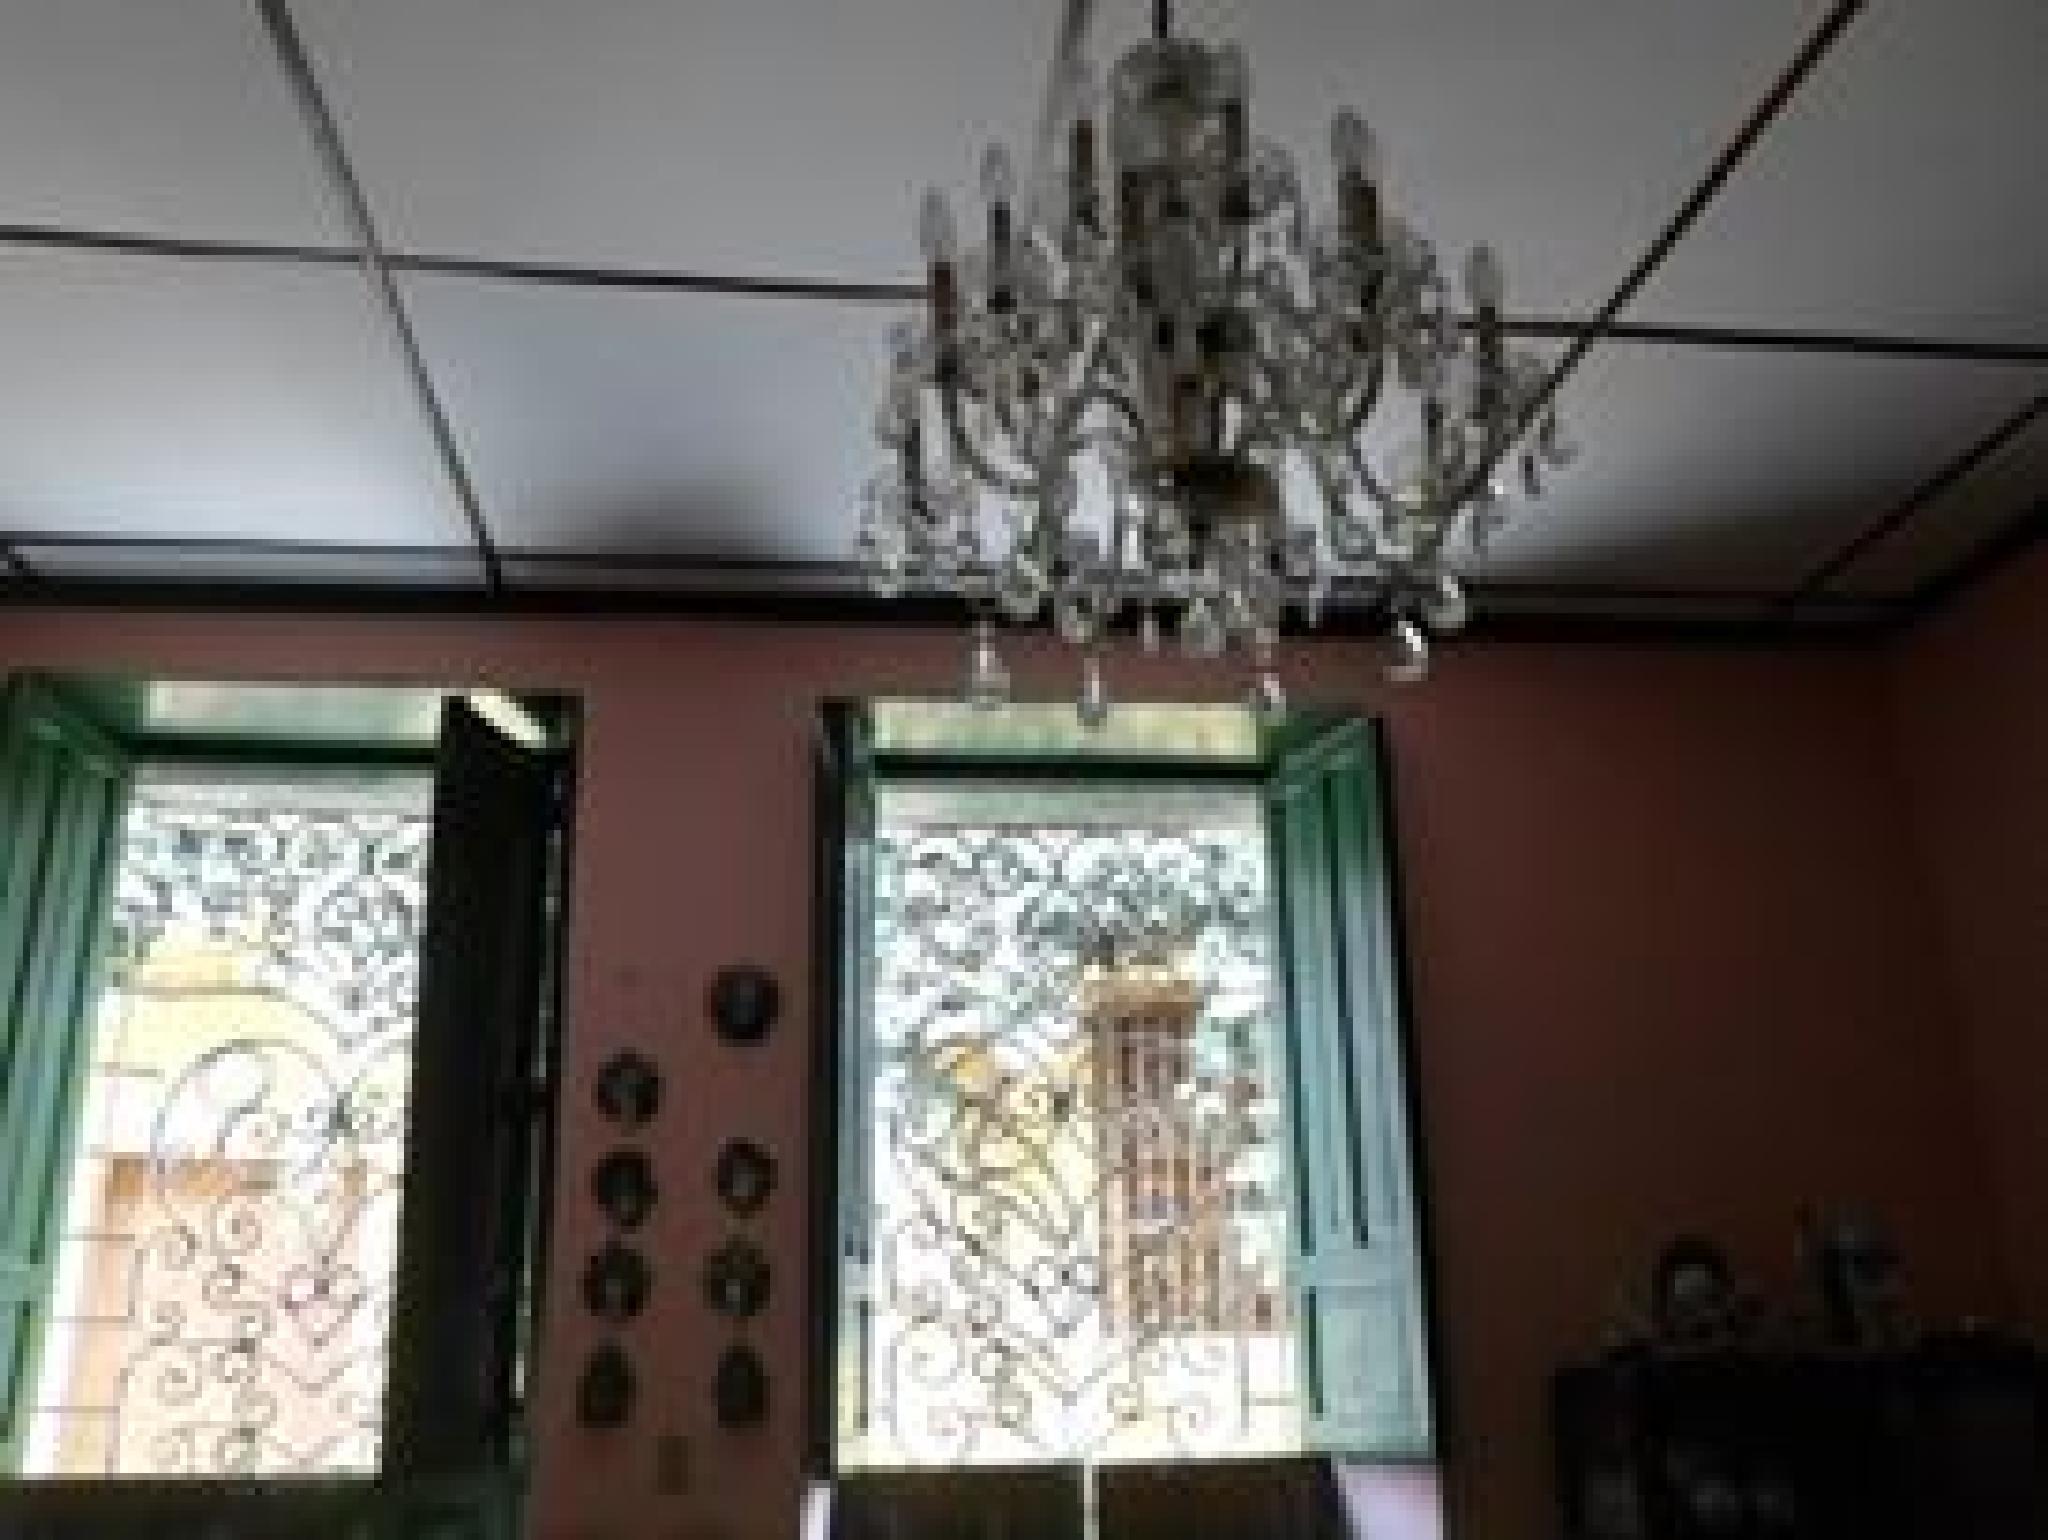 INTERIO COLONIAL HOUSE by castariza